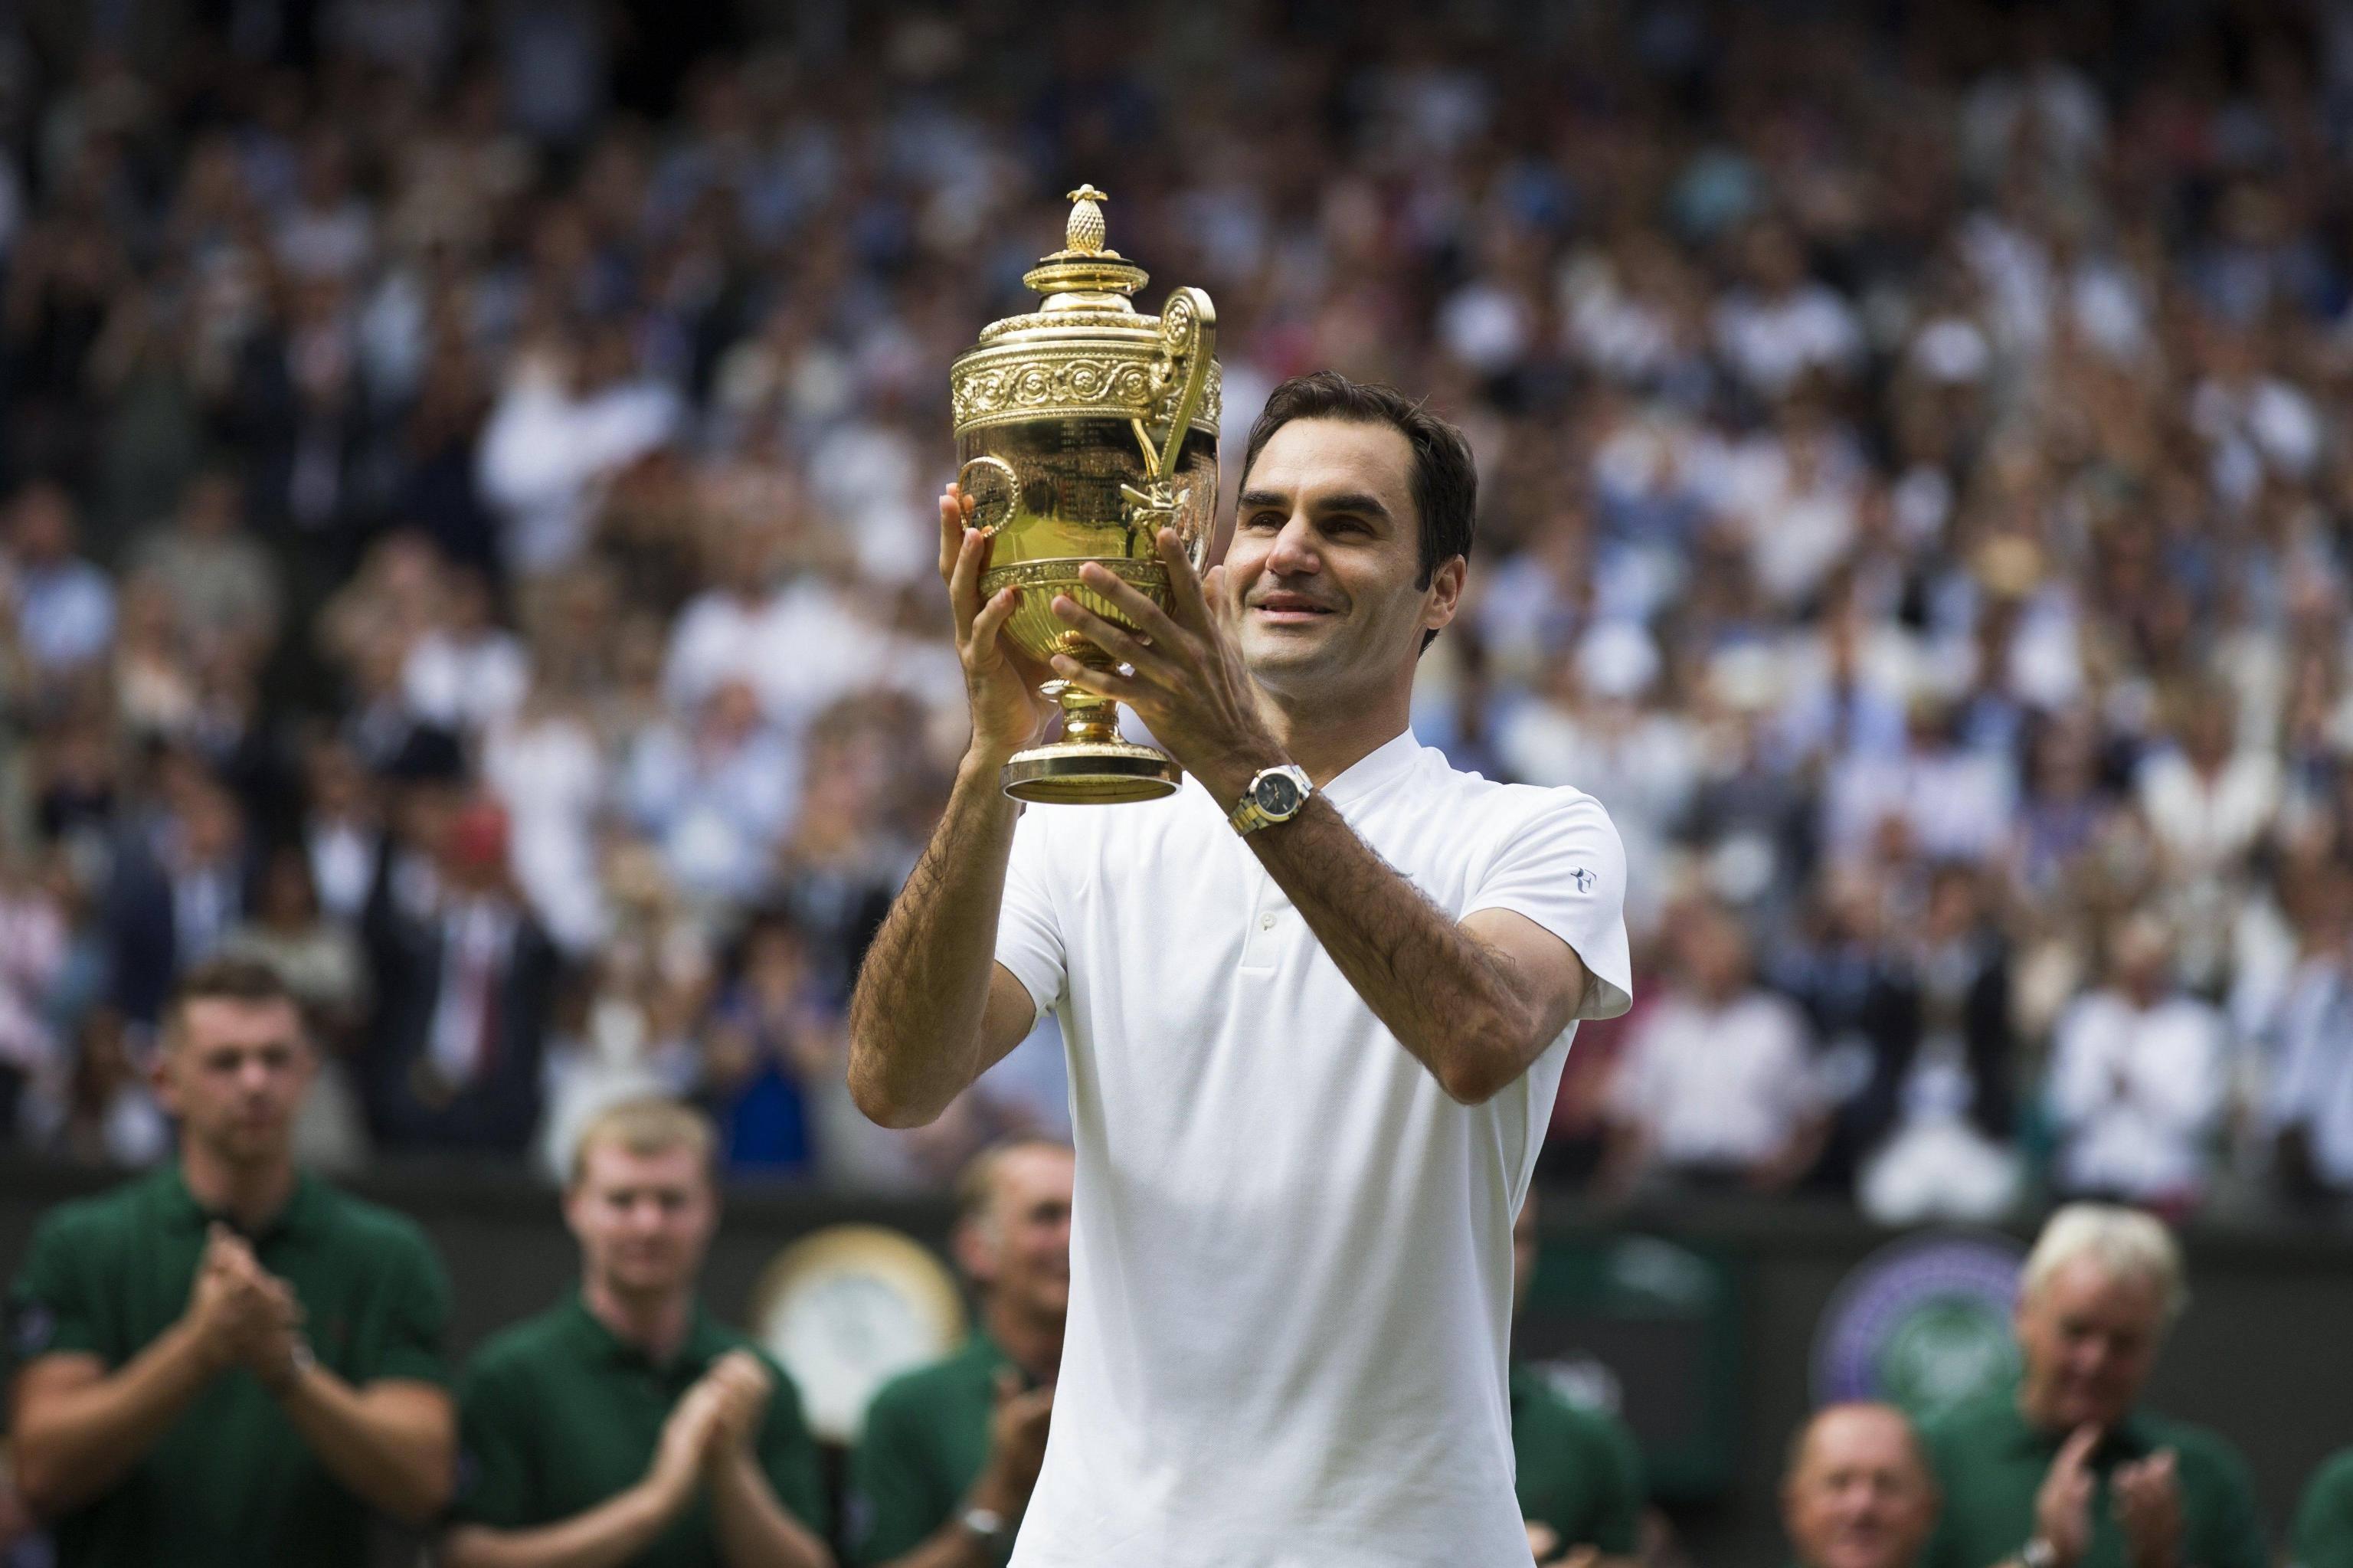 Roger Federer vince Wimbledon: la storia dei suoi 19 Slam